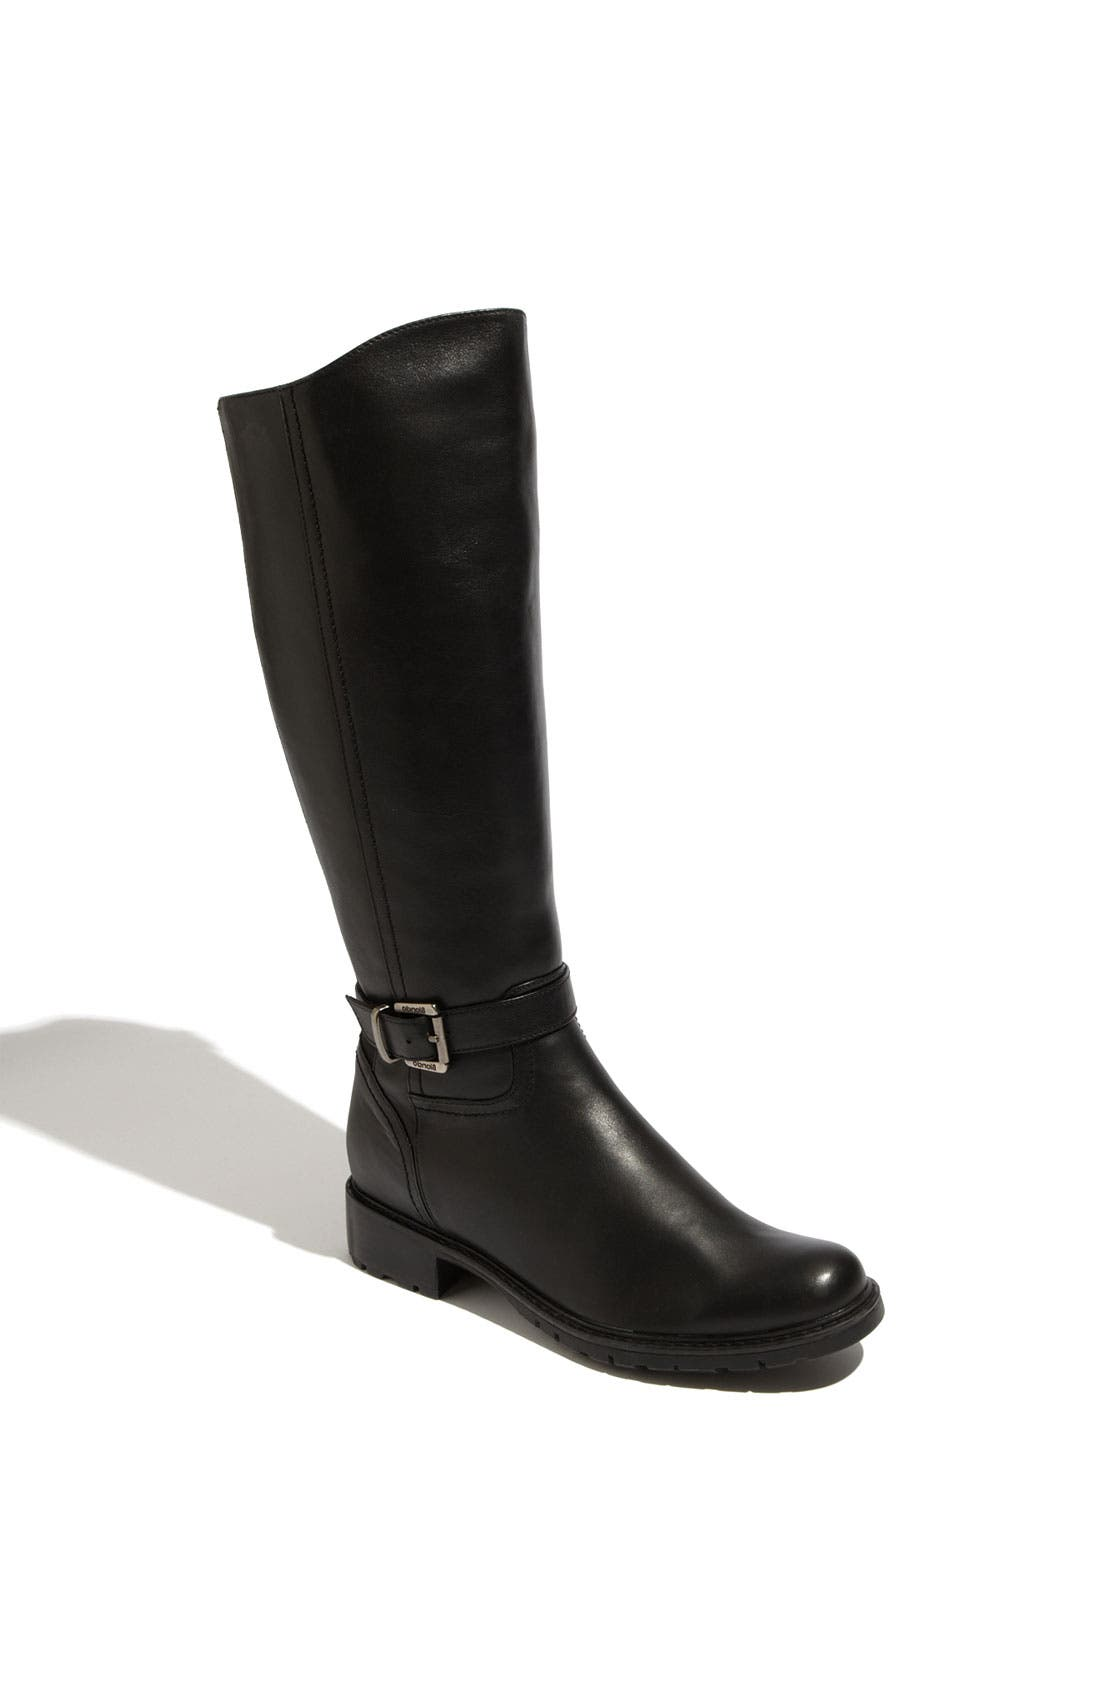 Main Image - Blondo 'Viviane' Waterproof Boot (Wide Calf)